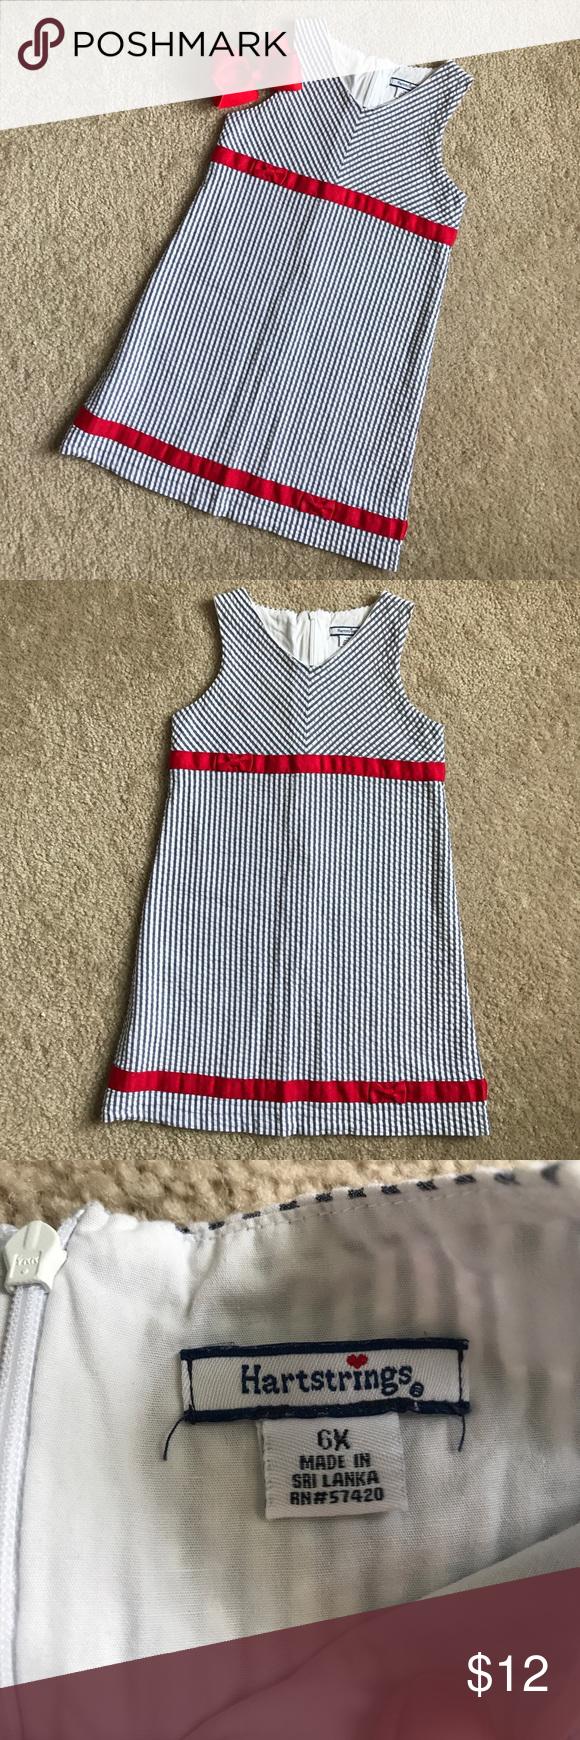 ❤️ Girls Nautical Seersucker Hartstrings Dress 6 Smoke-free, pet-free home. EUC. Bow not included. Hartstrings Dresses Casual